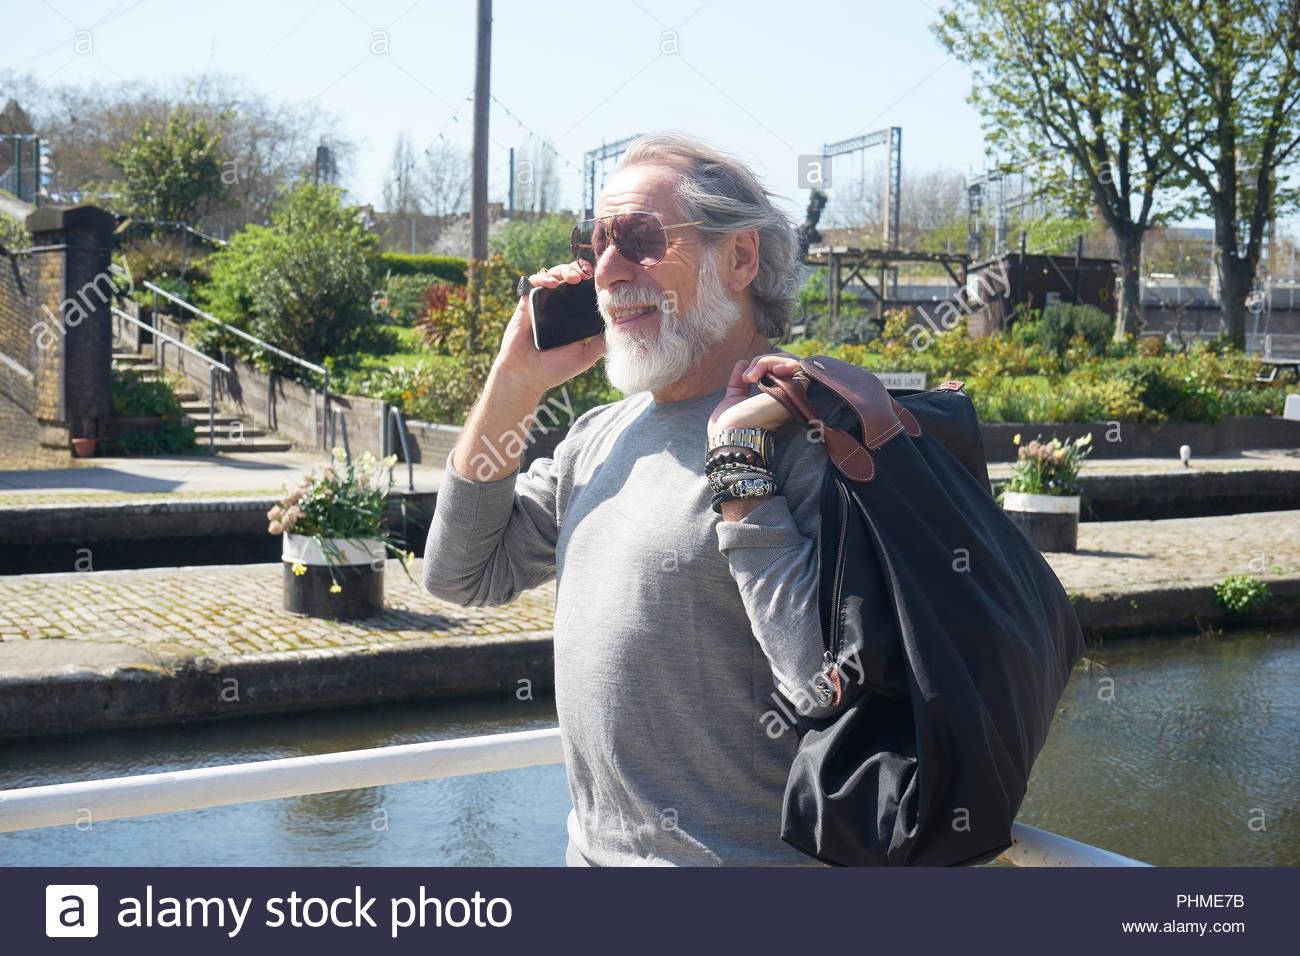 Senior man on phone call Photo Stock